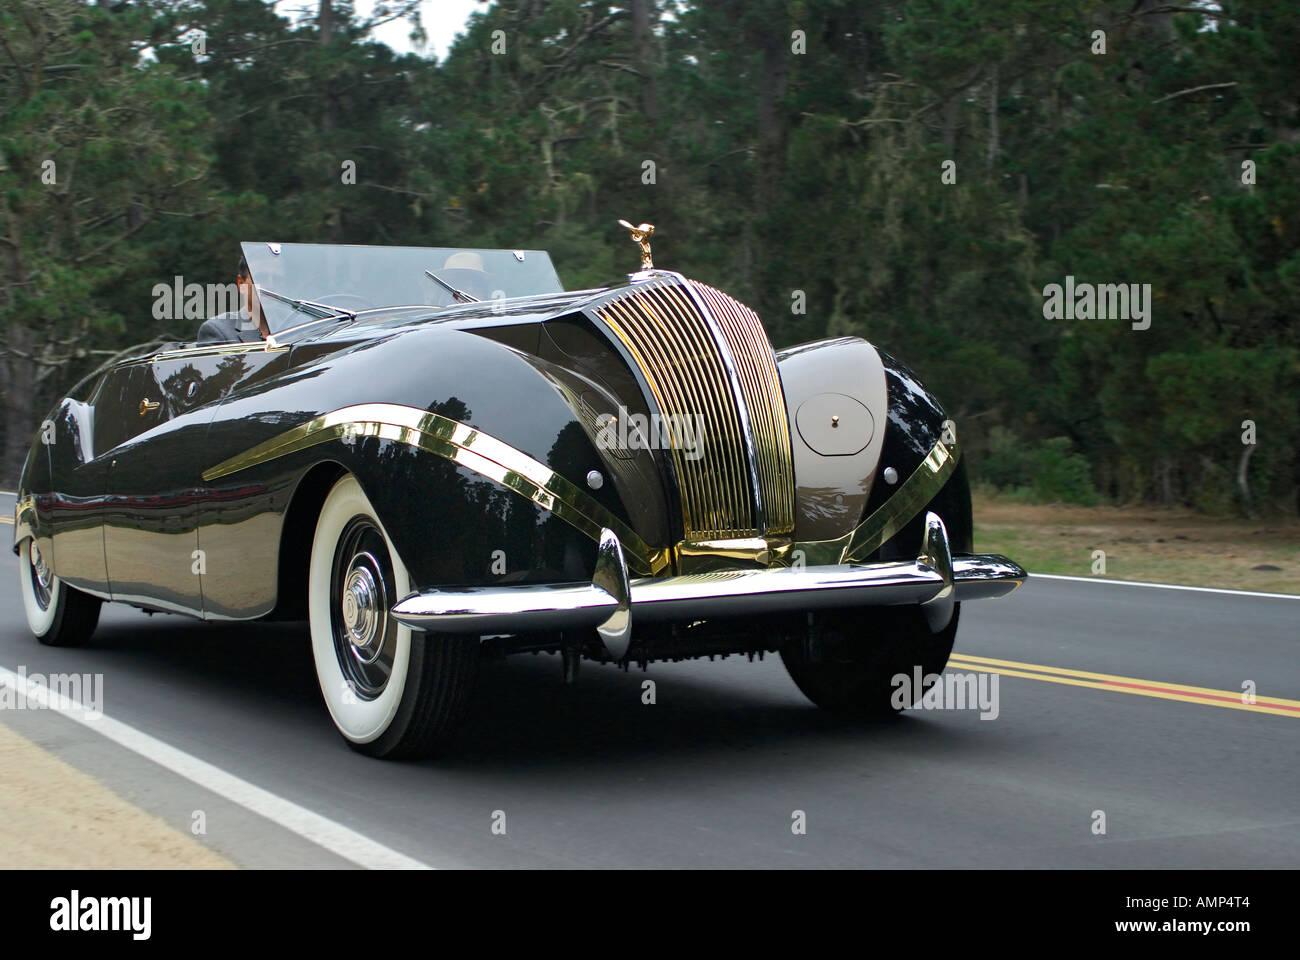 'Rolls Royce Phantom 3 ^Labourdette Vue ^Totale, ^1939' - Stock Image